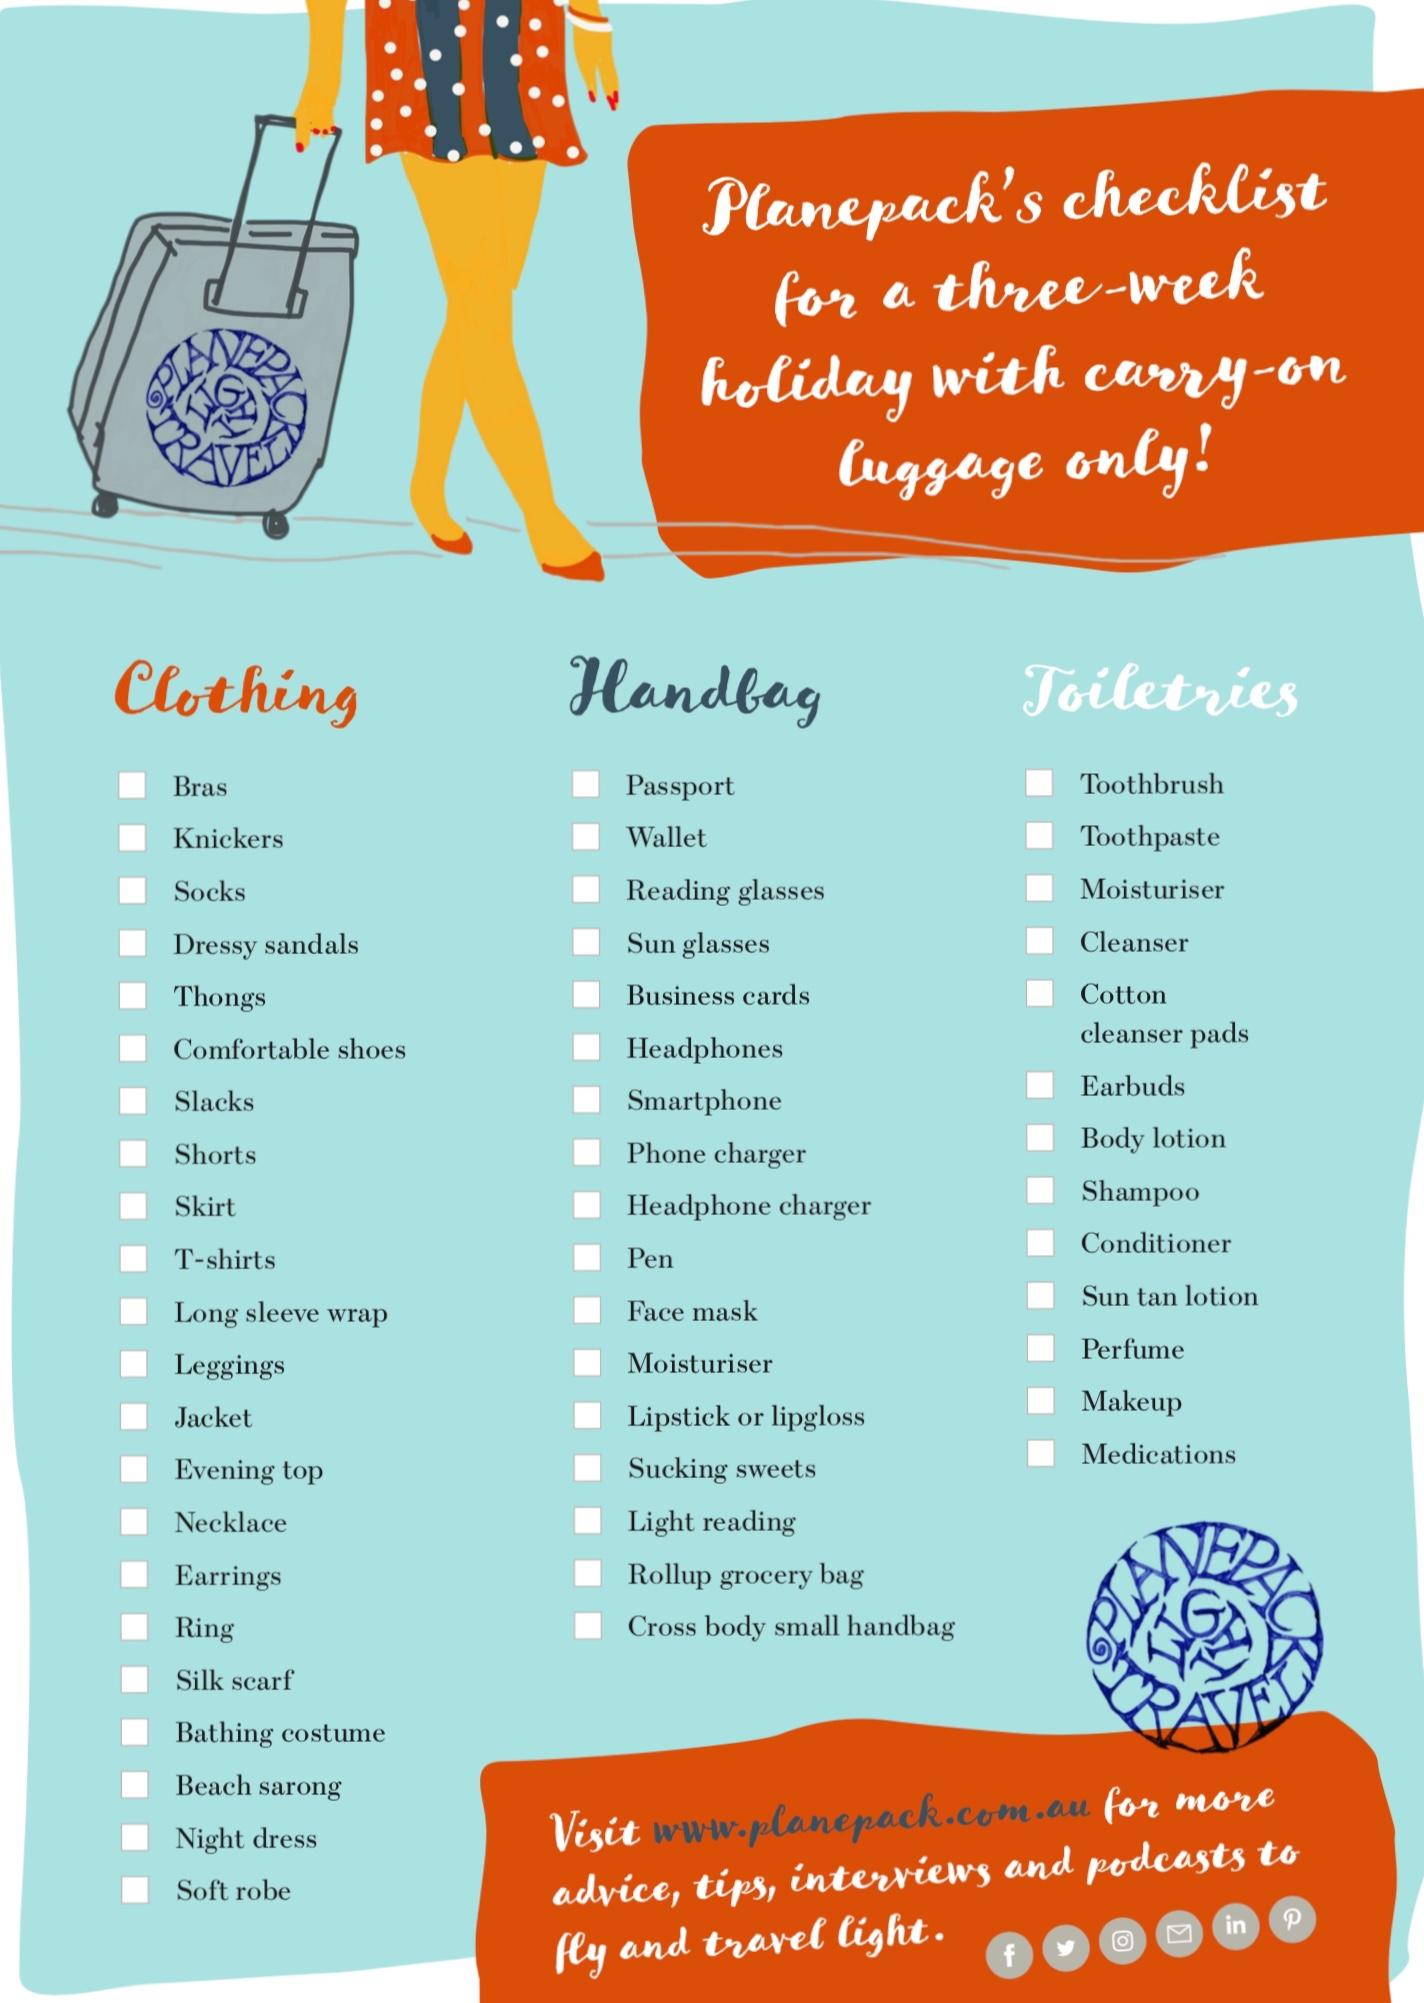 Travel light - Planepack checklist